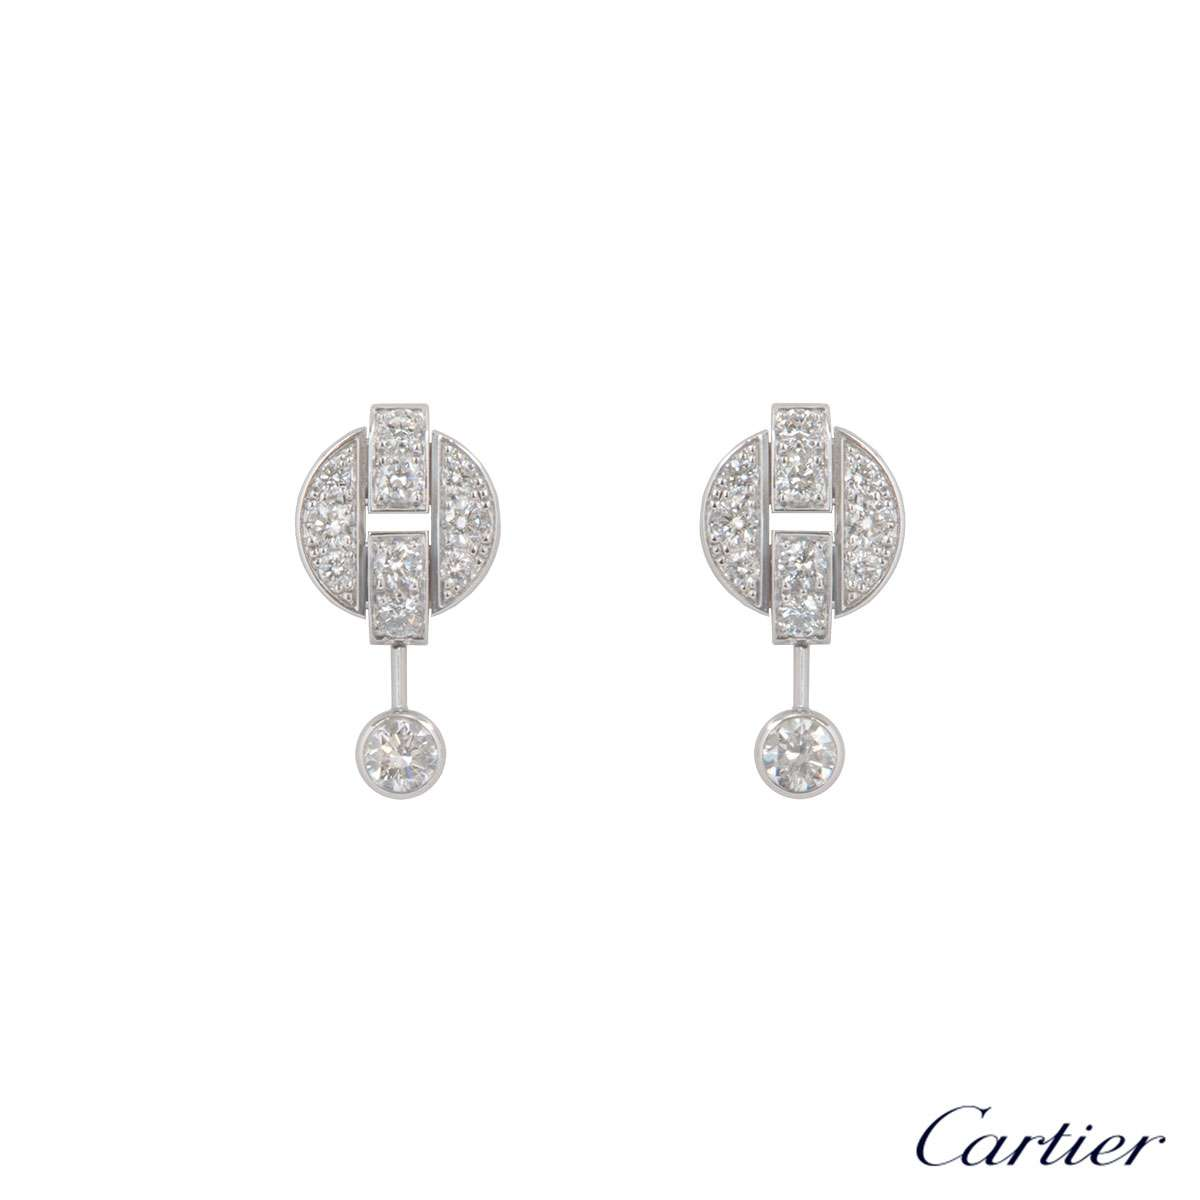 Cartier White Gold Himalia Diamond Earrings